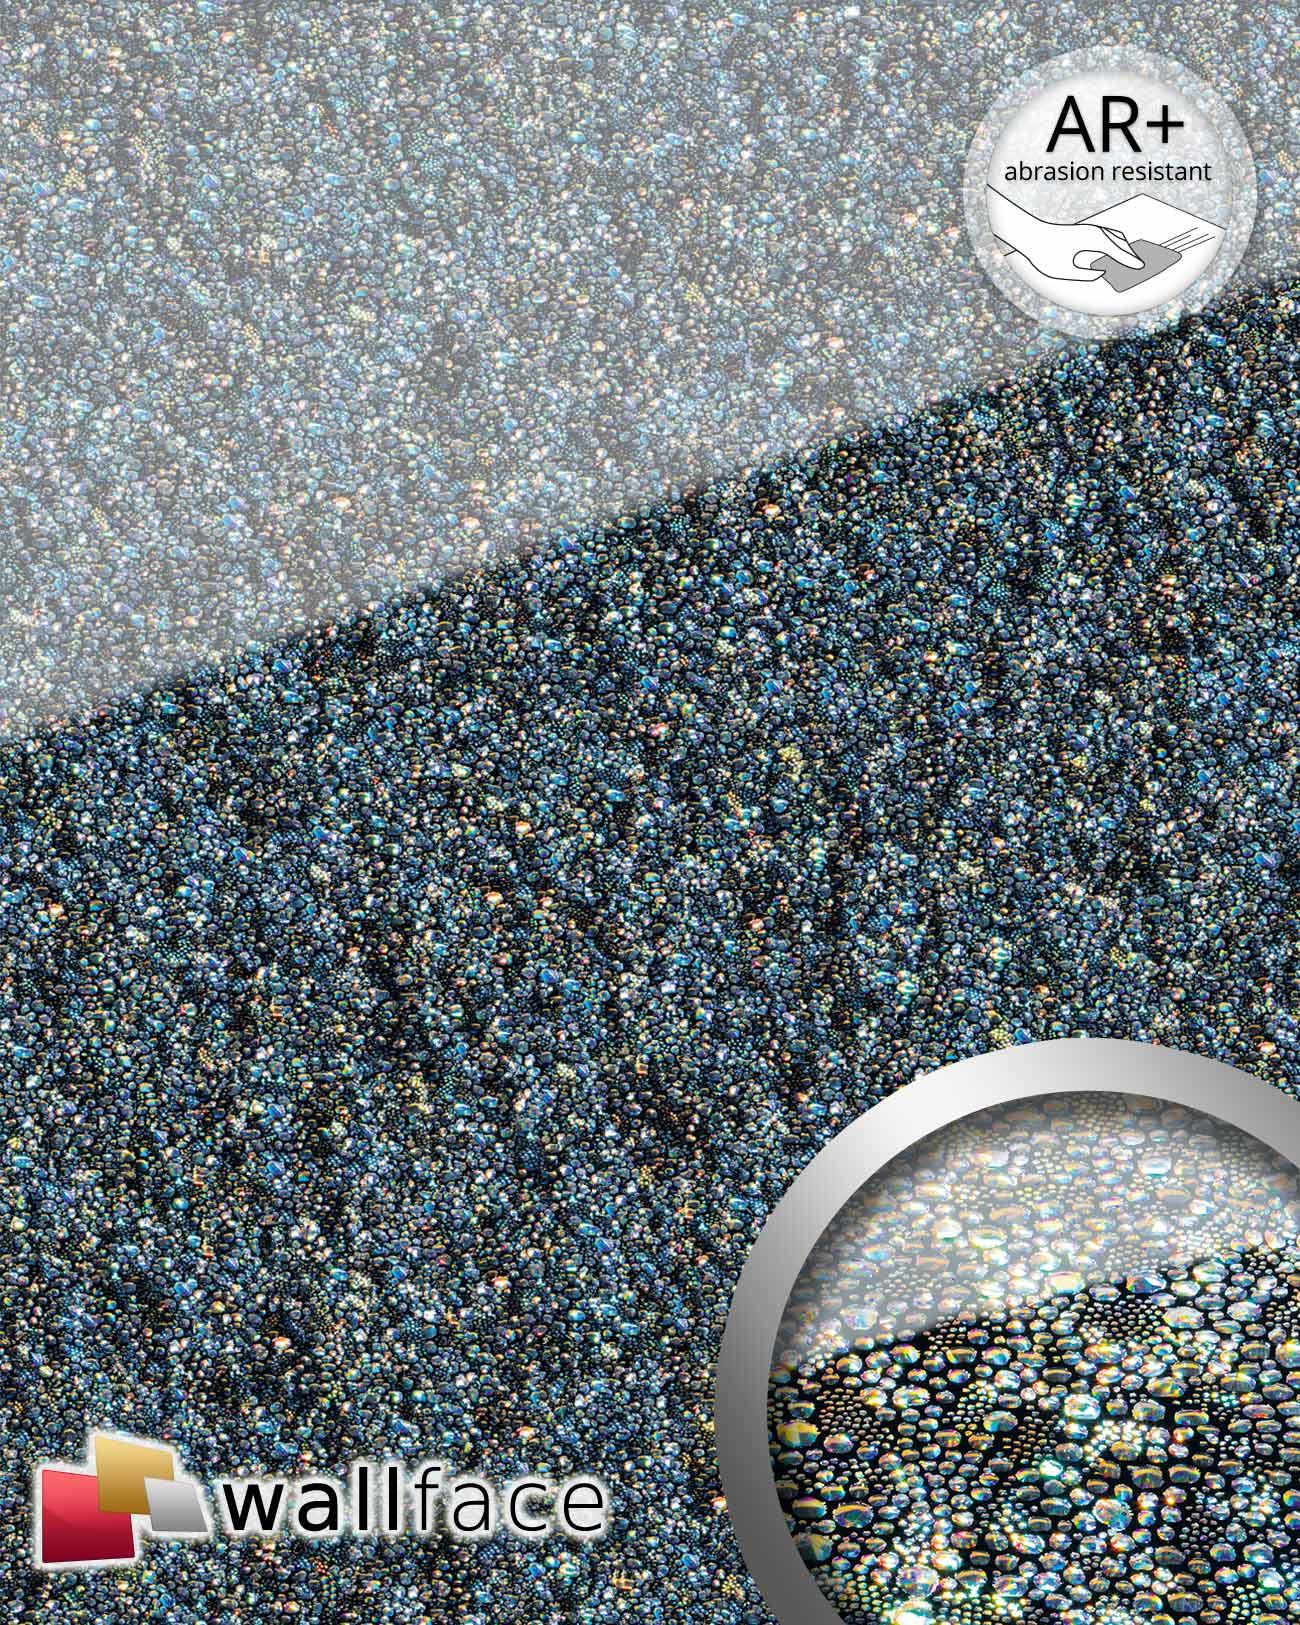 Panou Decorativ S-glass 17001-ar  Wallface  Autoco